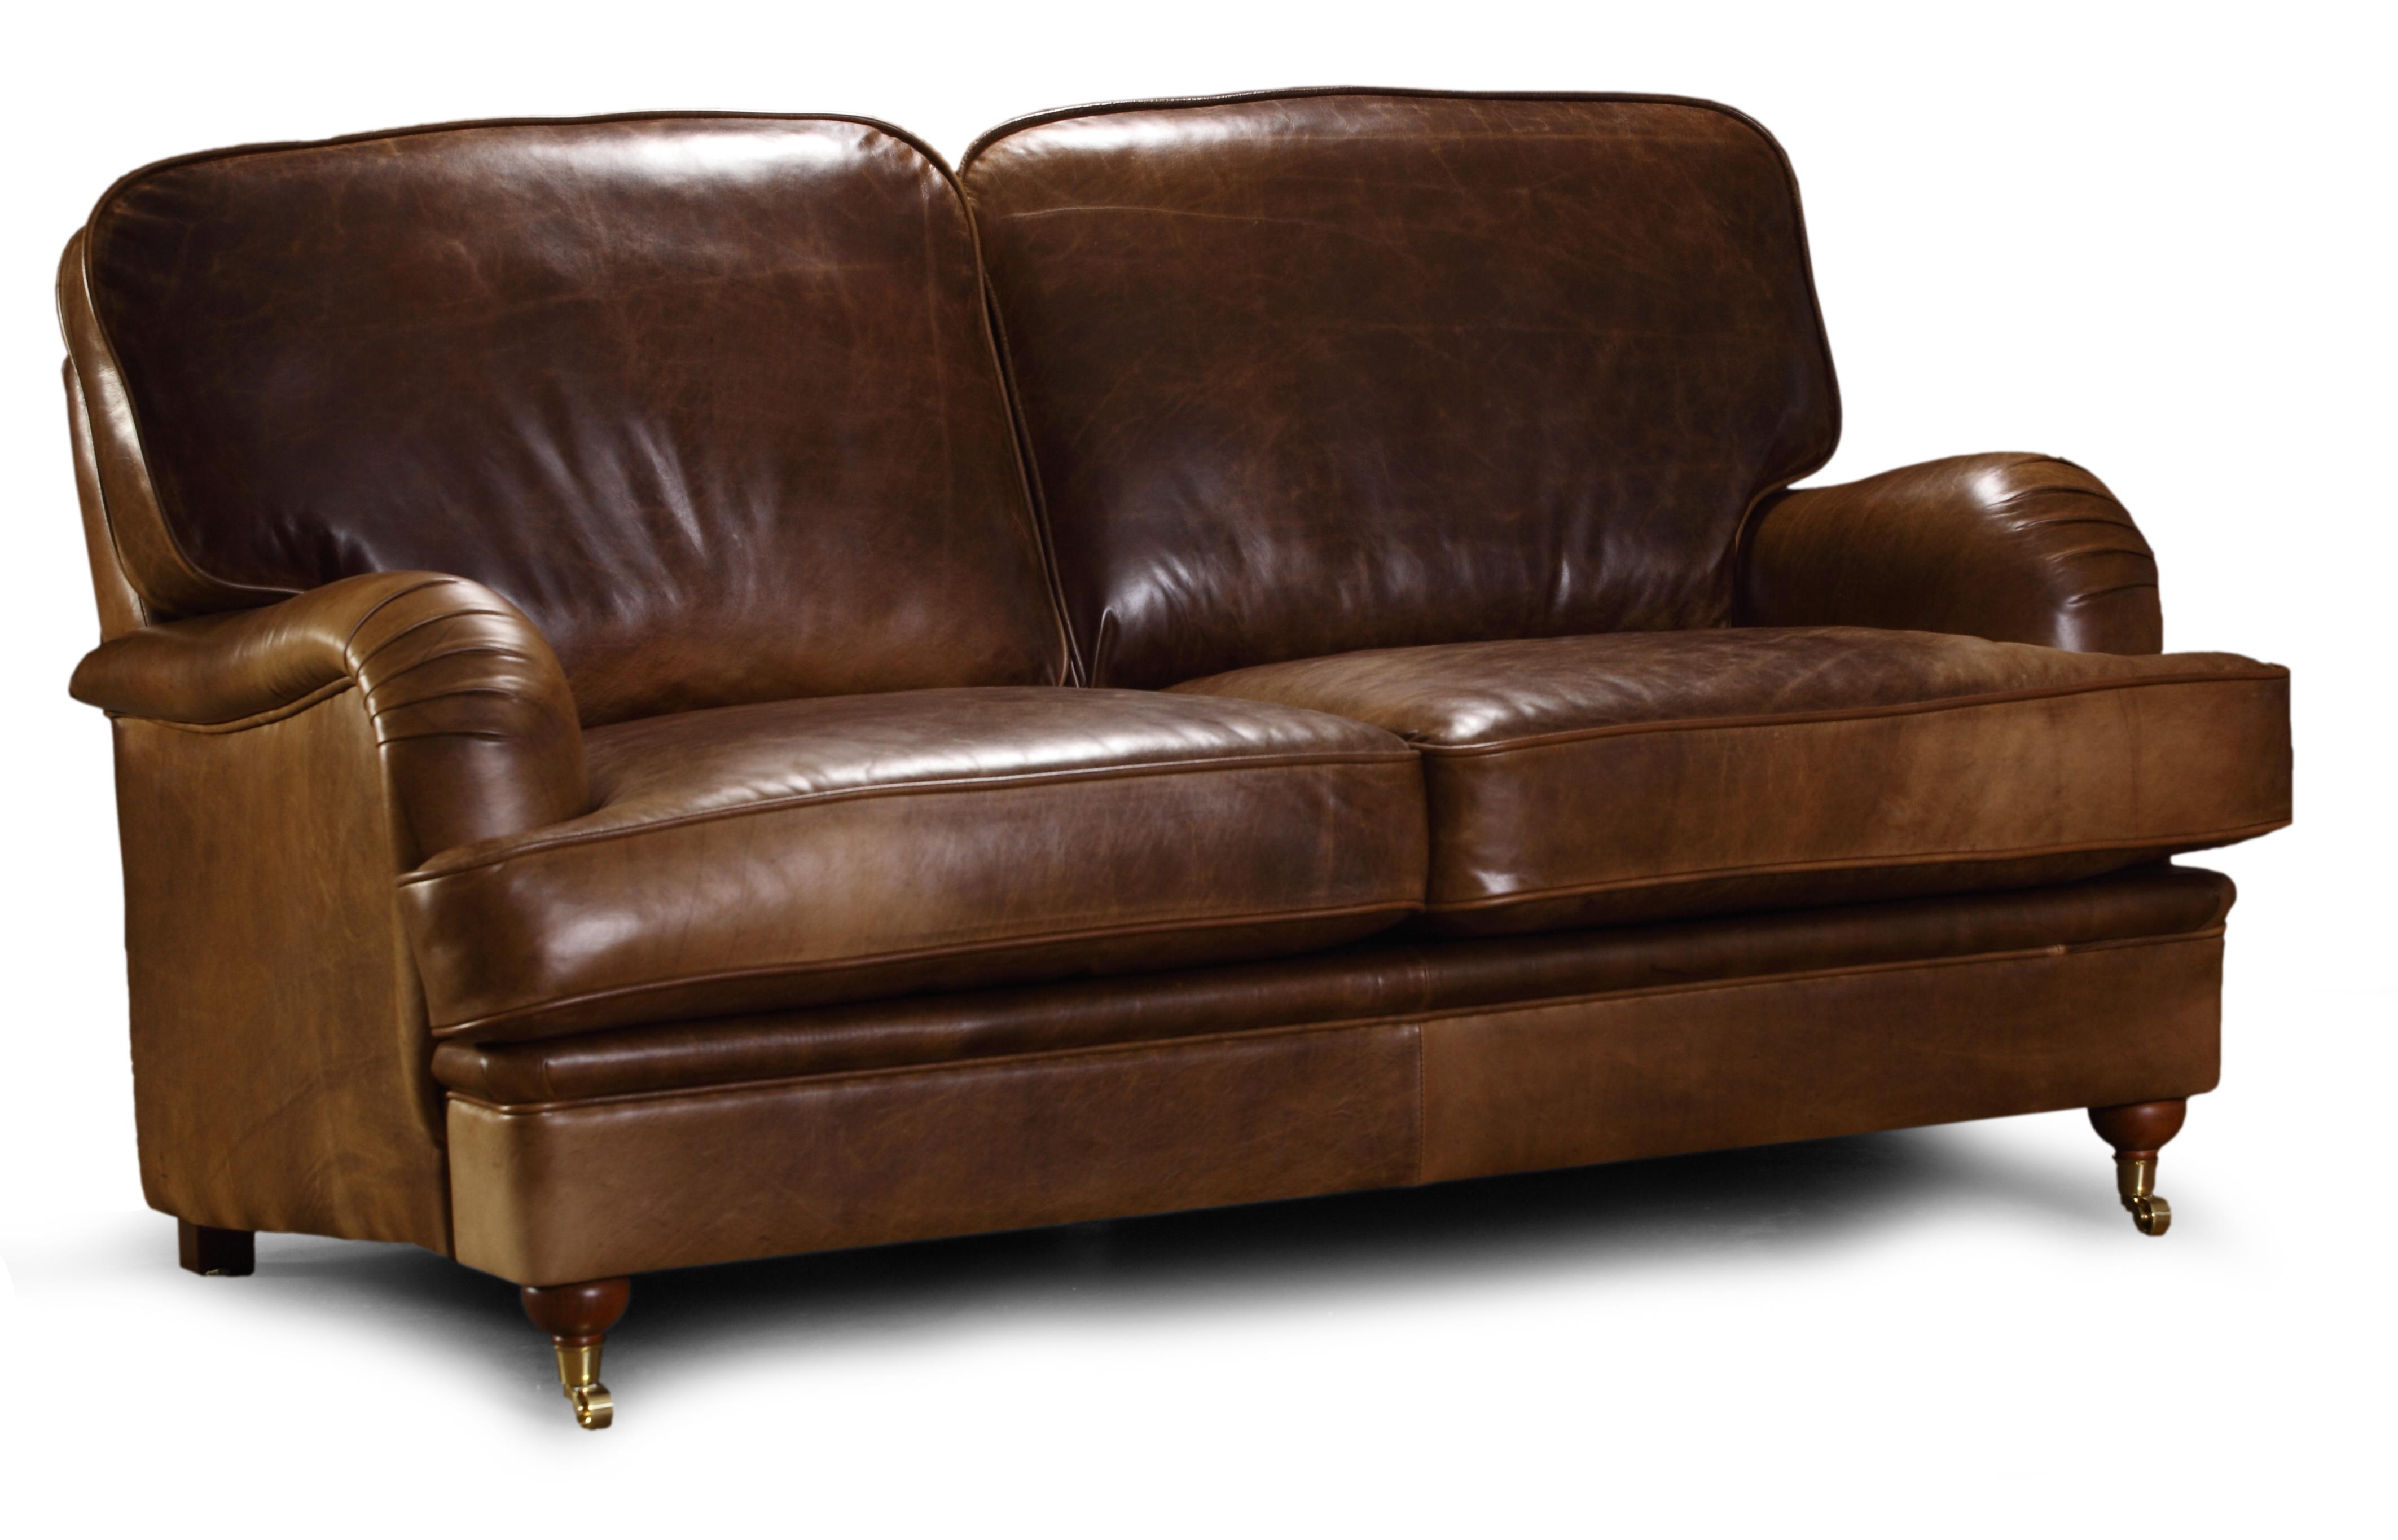 Canapea fixa 3 locuri Winston Lux